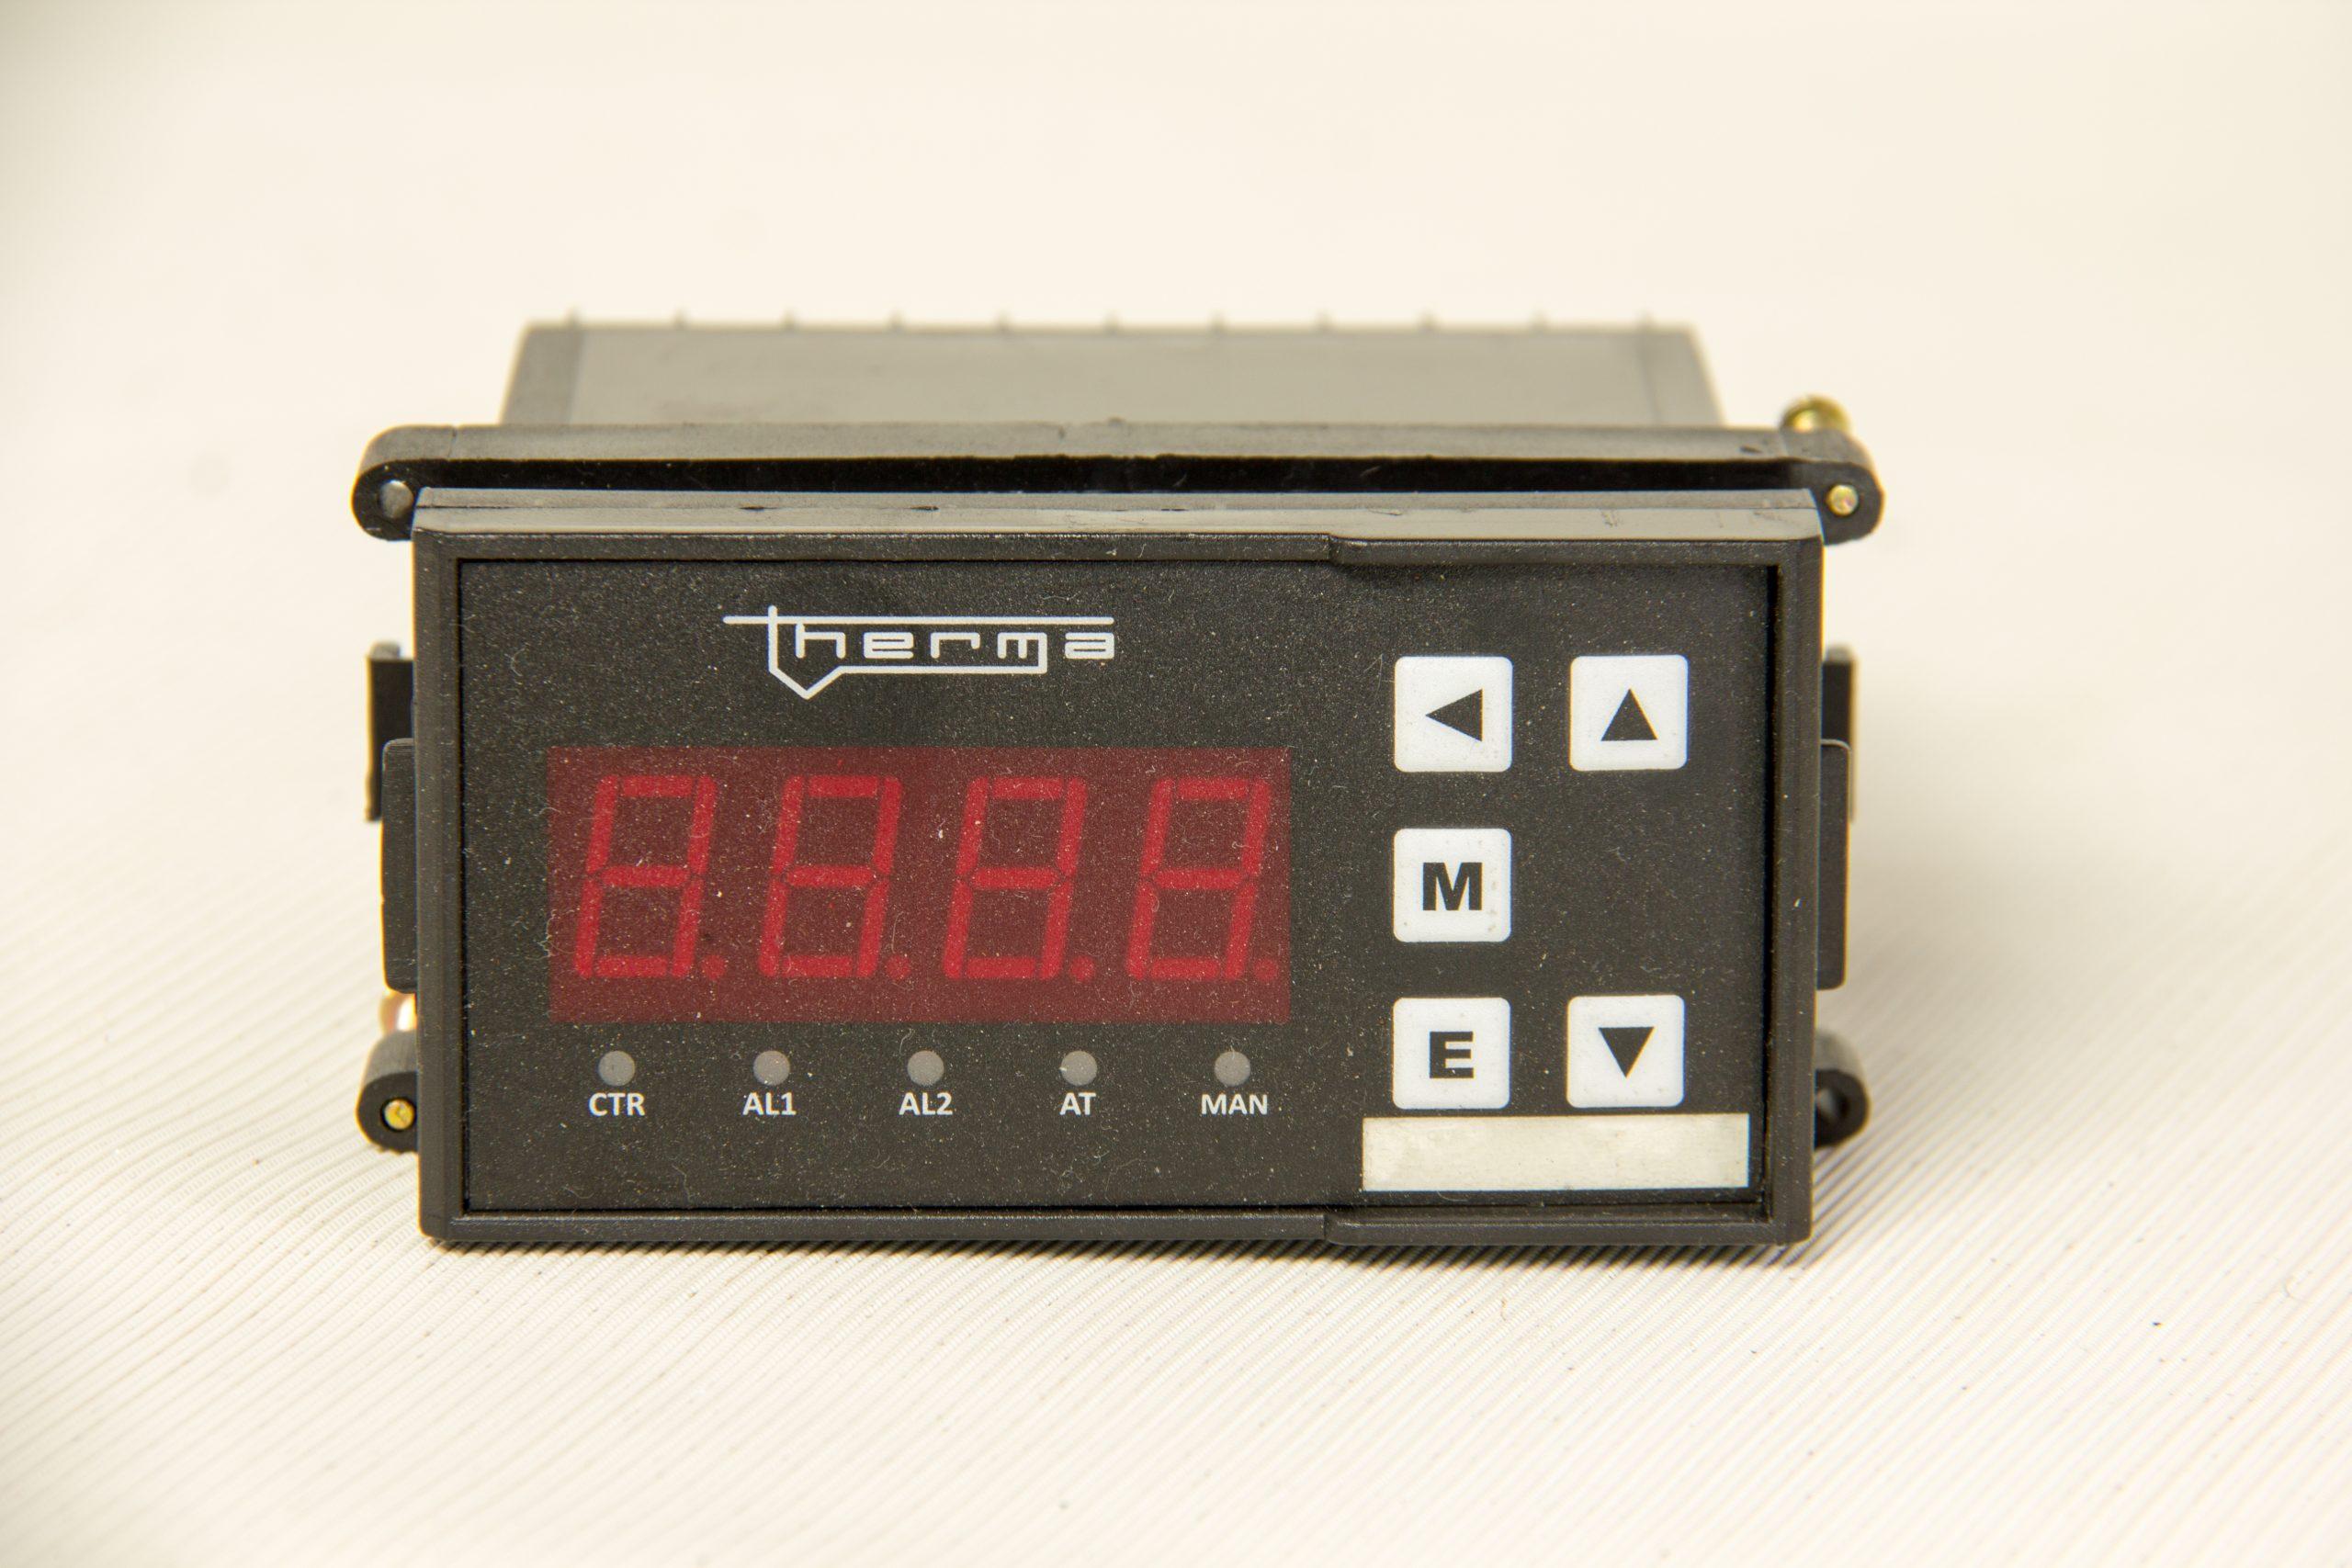 Transmissores Thermitrans Série TI